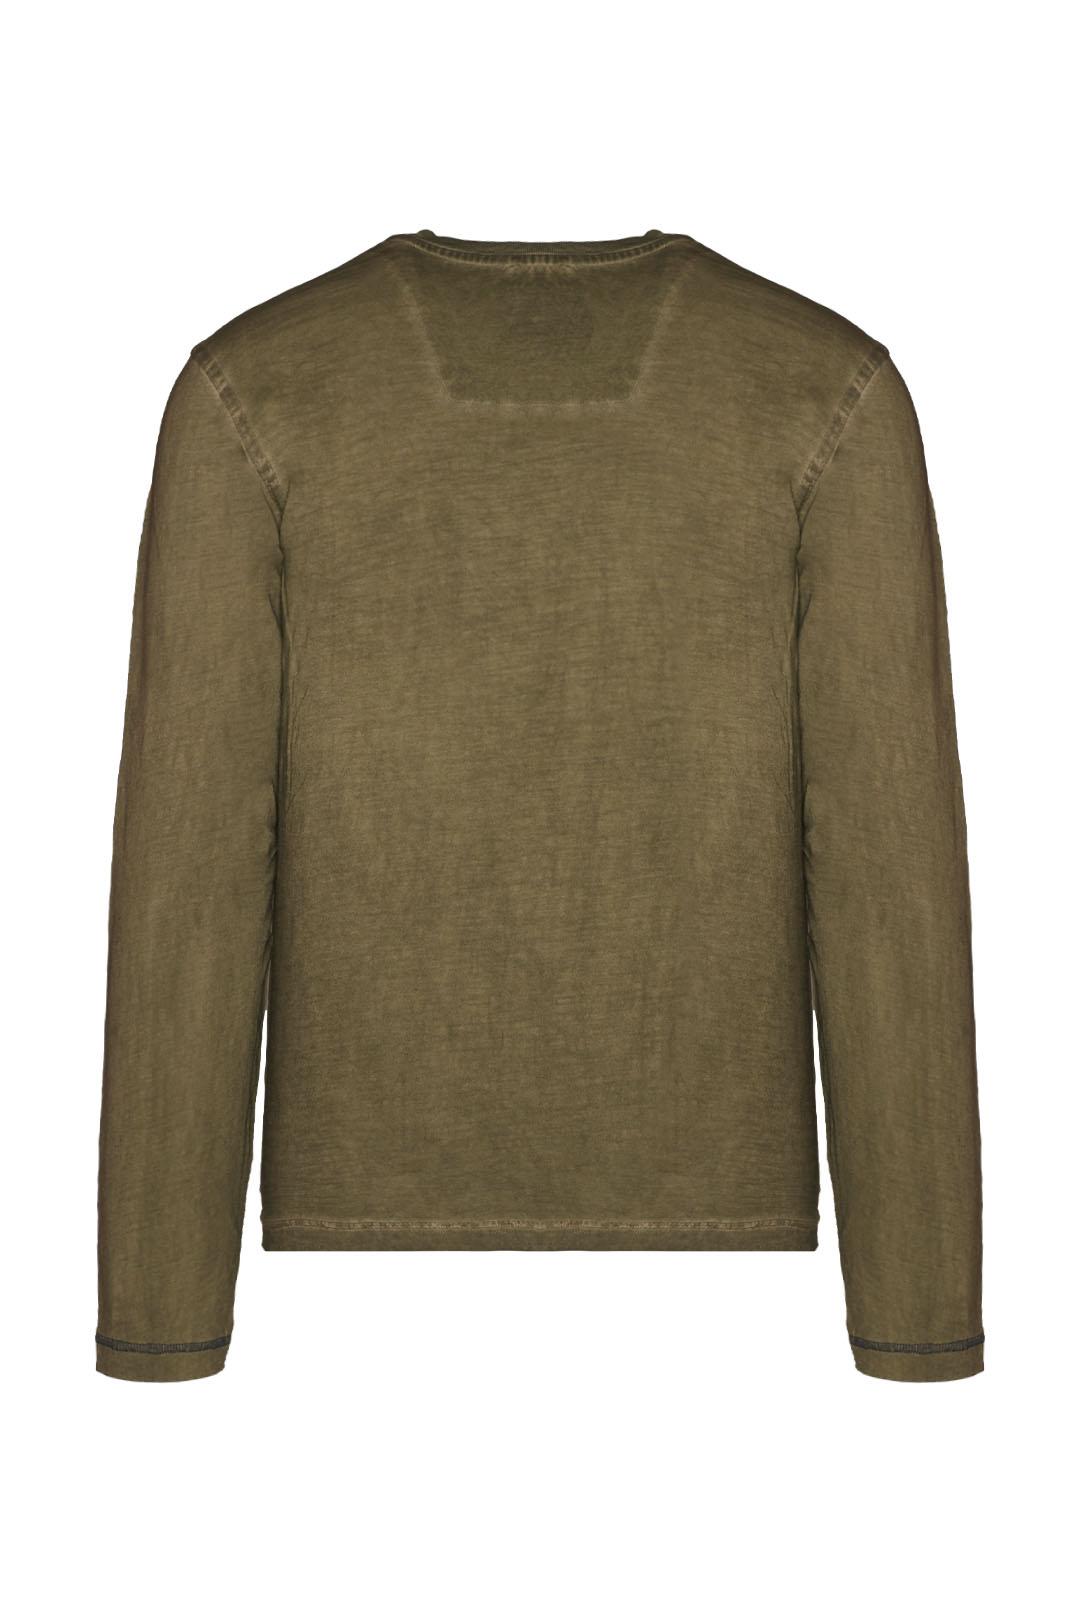 Long-sleeved t-shirt in slub jersey      2